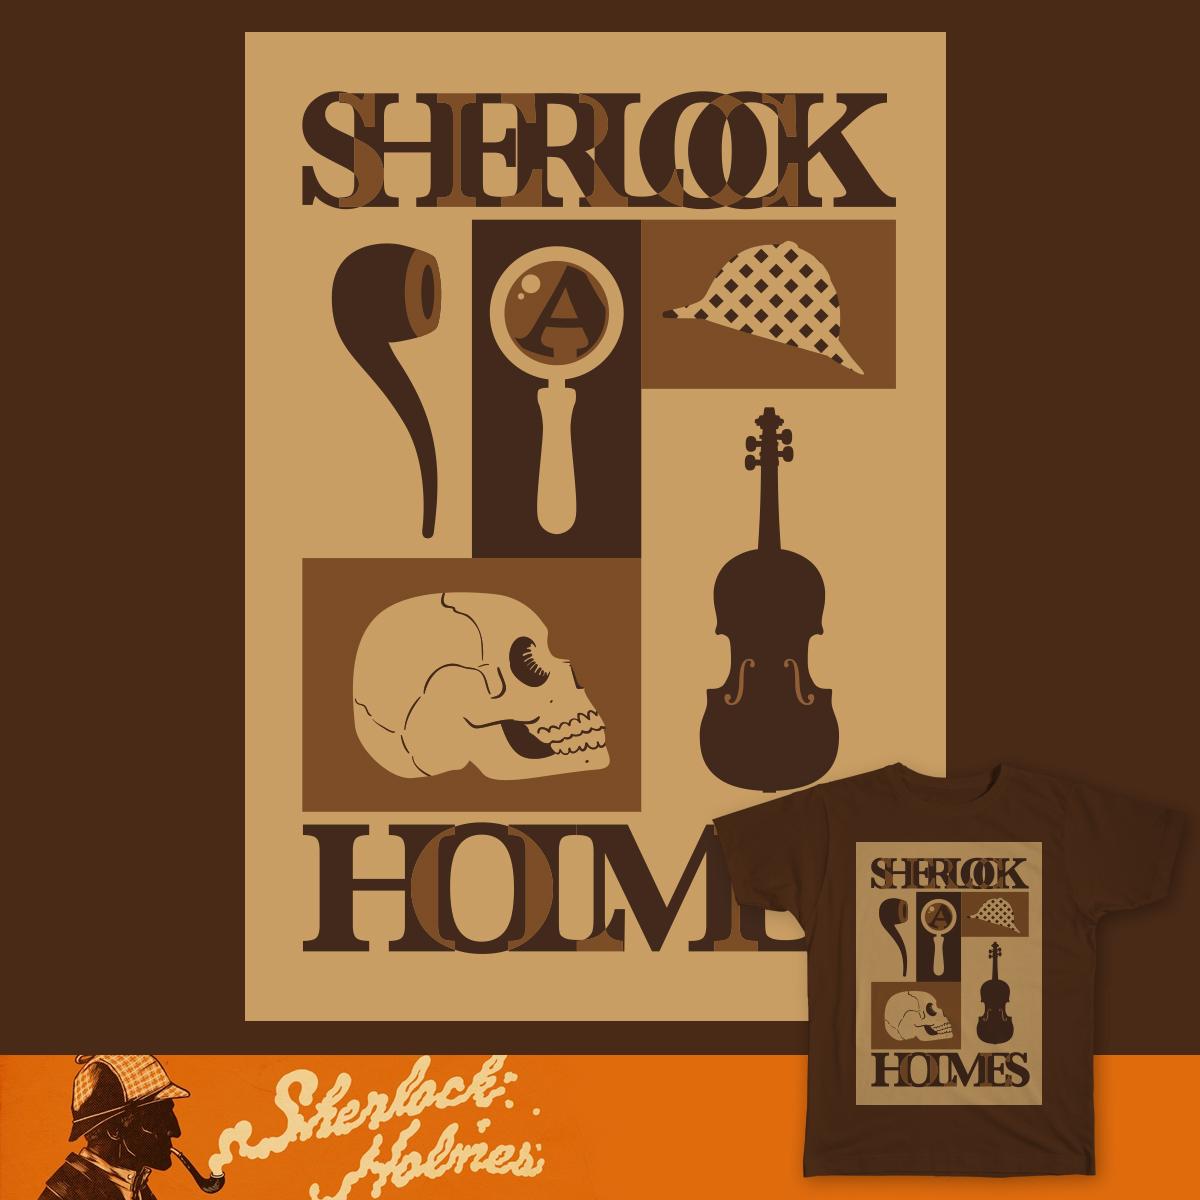 SHERLOCKS SCRAPBOOK by dreetsch on Threadless